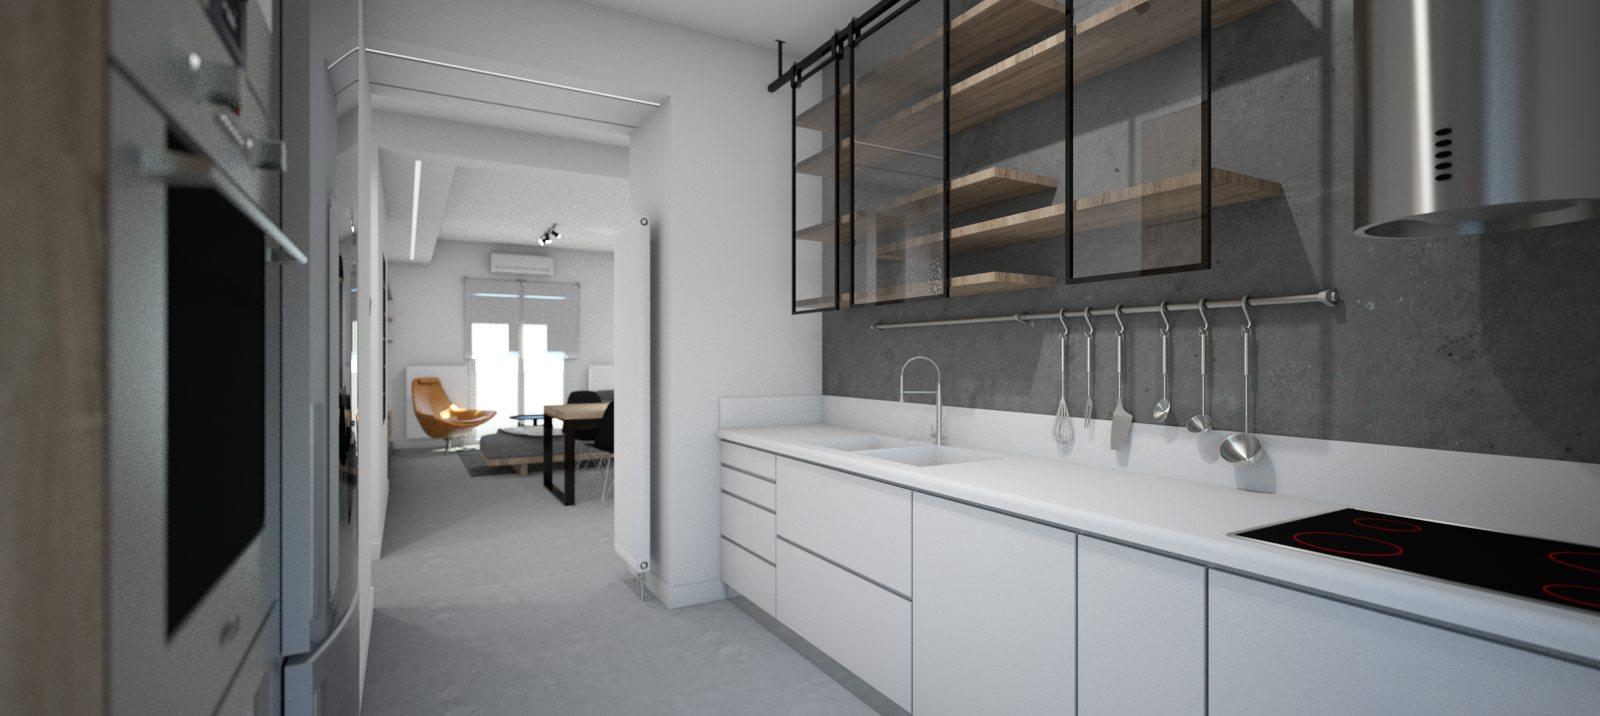 archicostudio_house-ts05_kitchen2